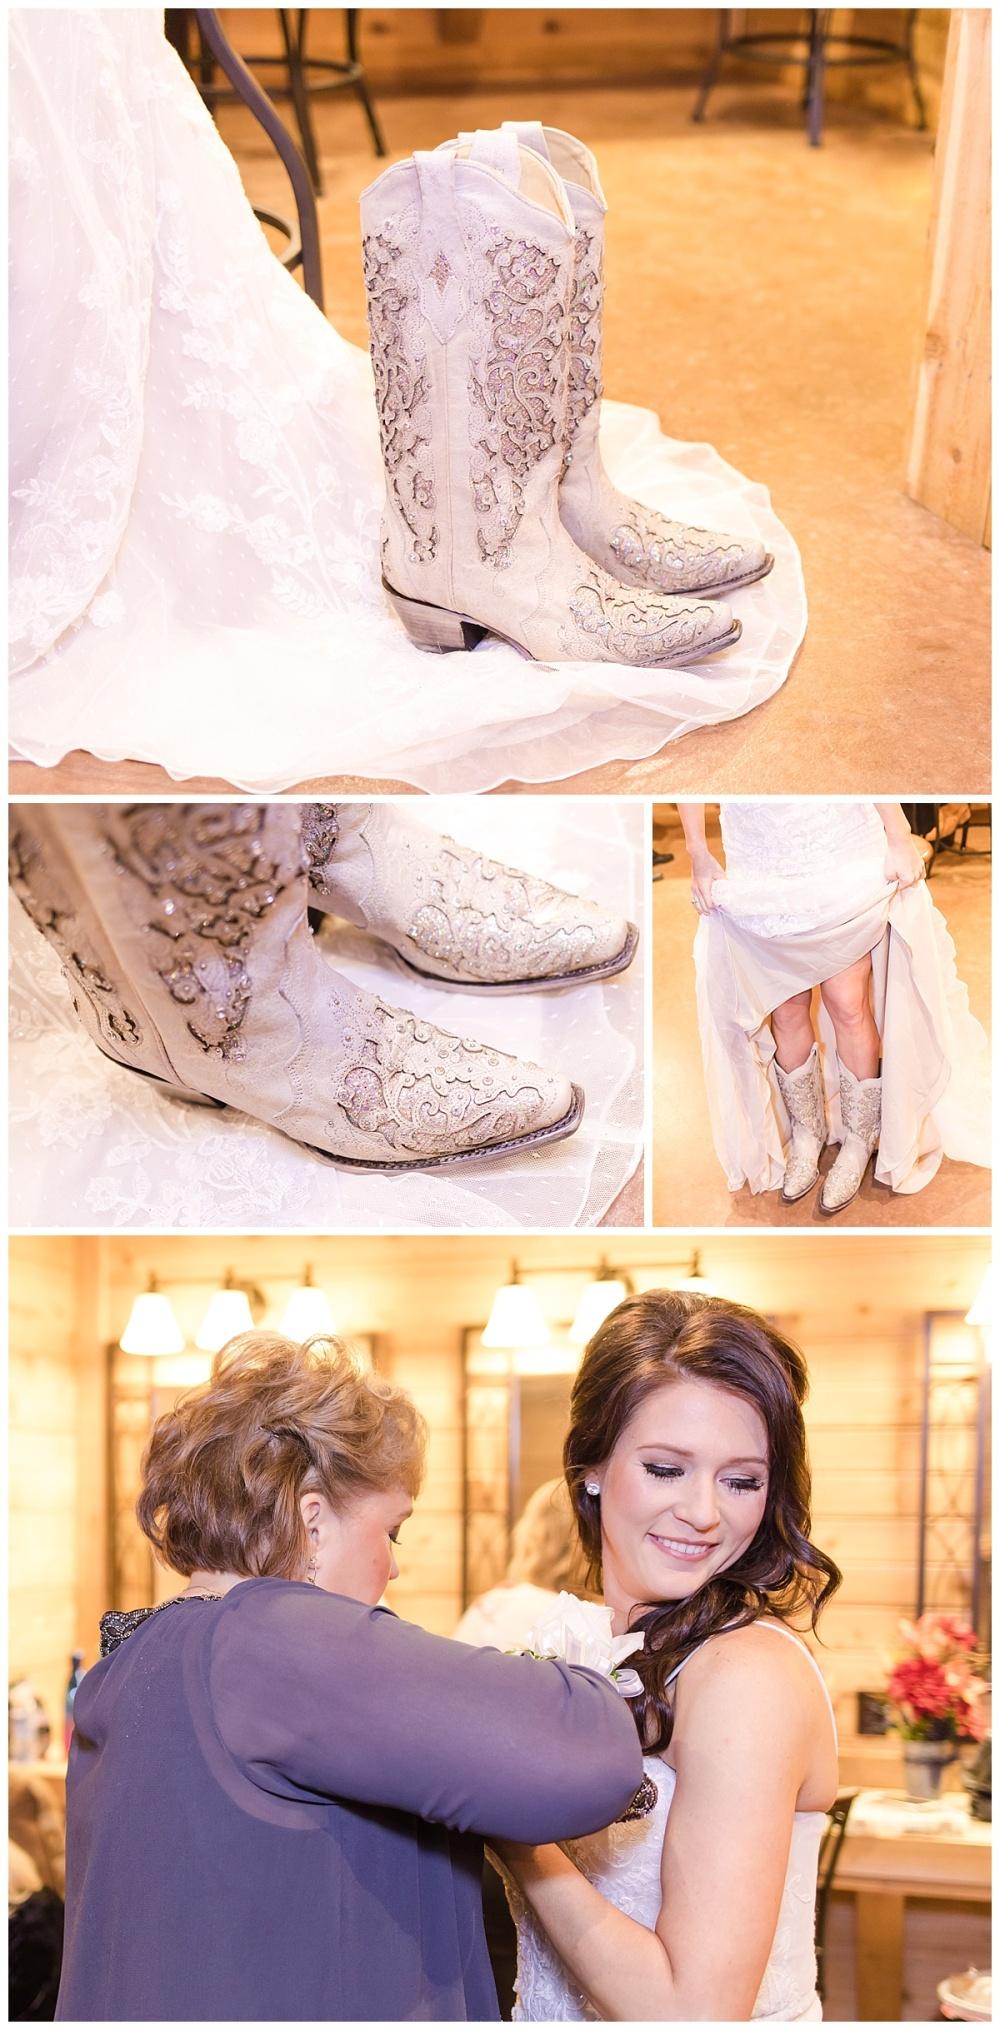 Carly-Barton-Photography-Geronimo-Oaks-Wedding-Venue-Texas-Hill-Country-Ronnie-Sarah_0081.jpg